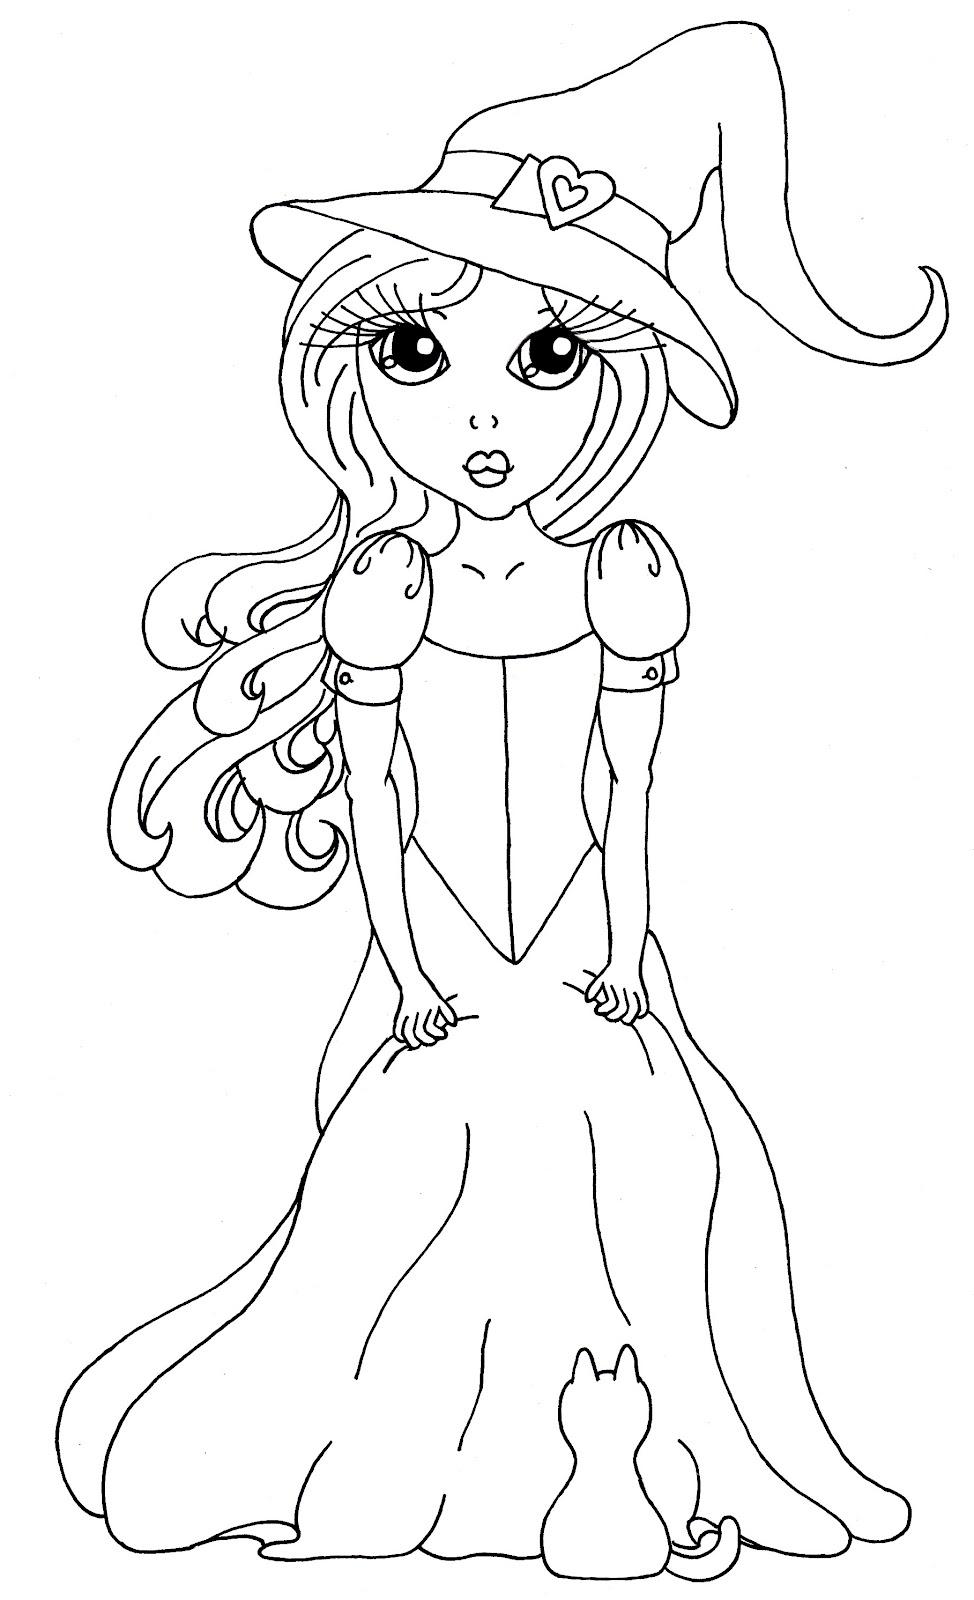 cuddlebug cuties  josephine the stylish witch